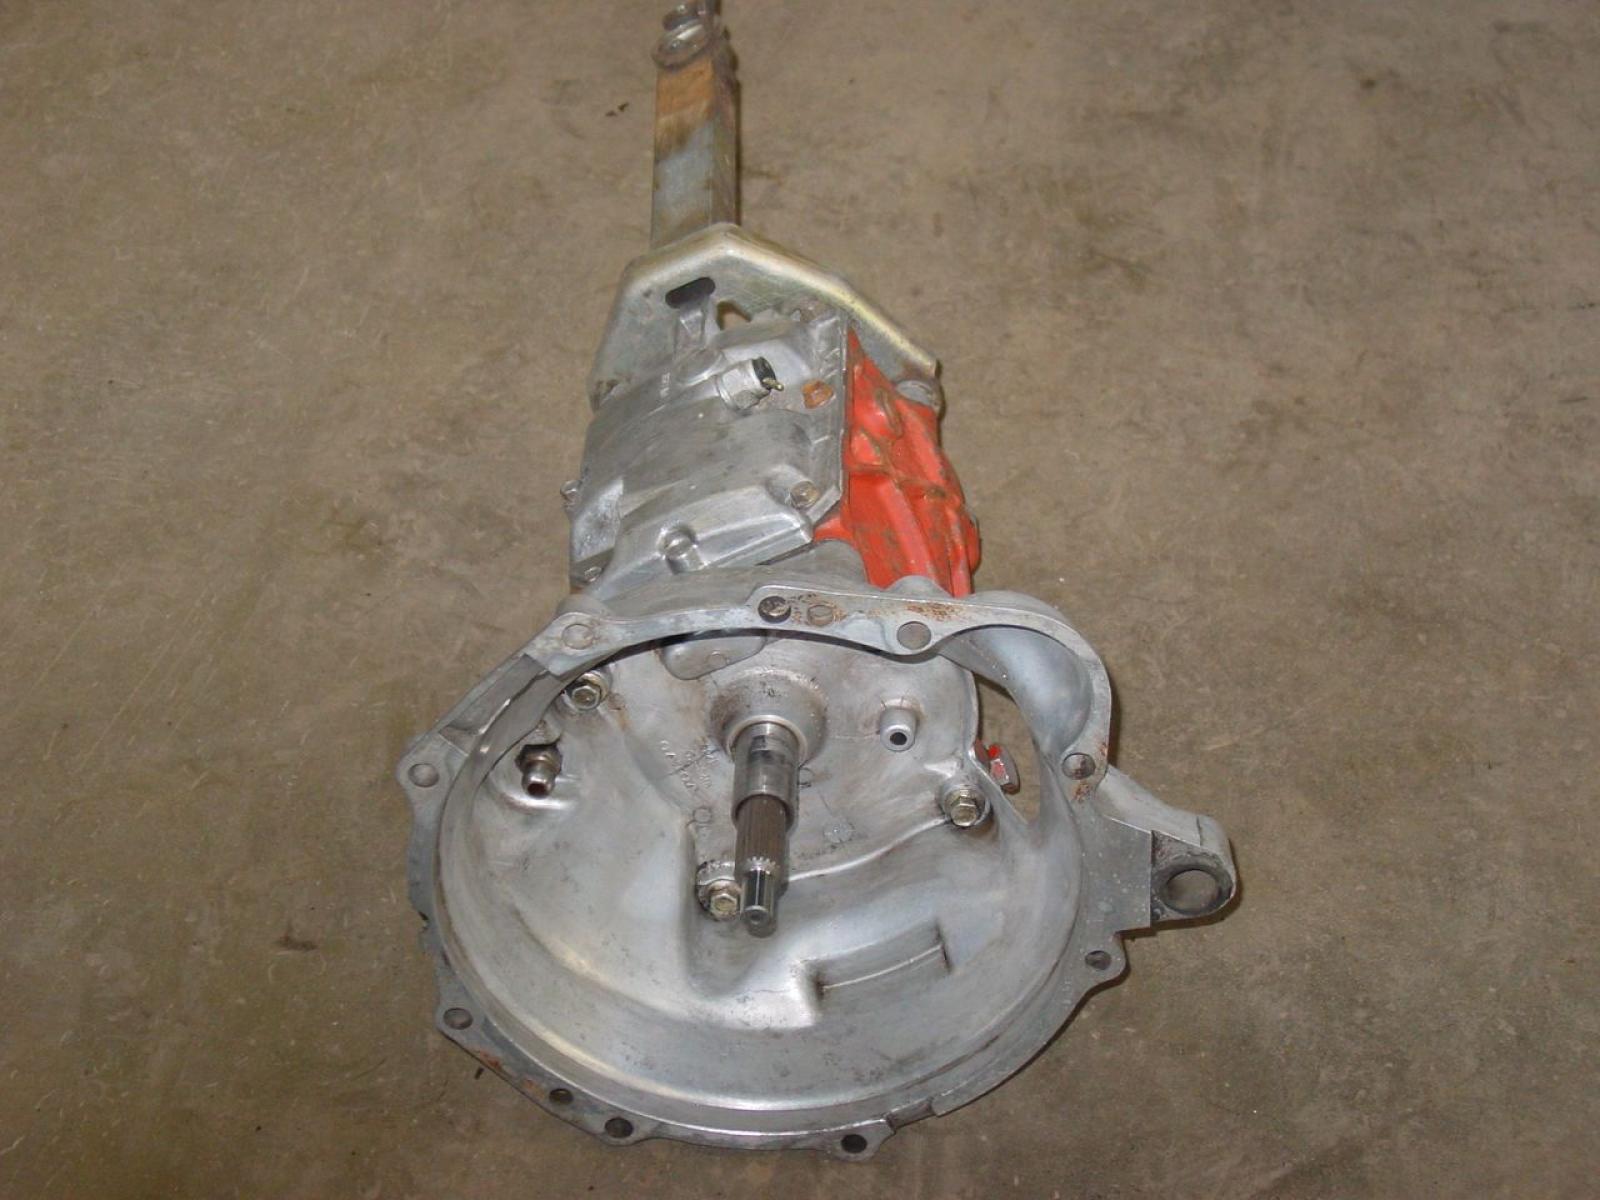 Volvo m-45 direct transmission - 2